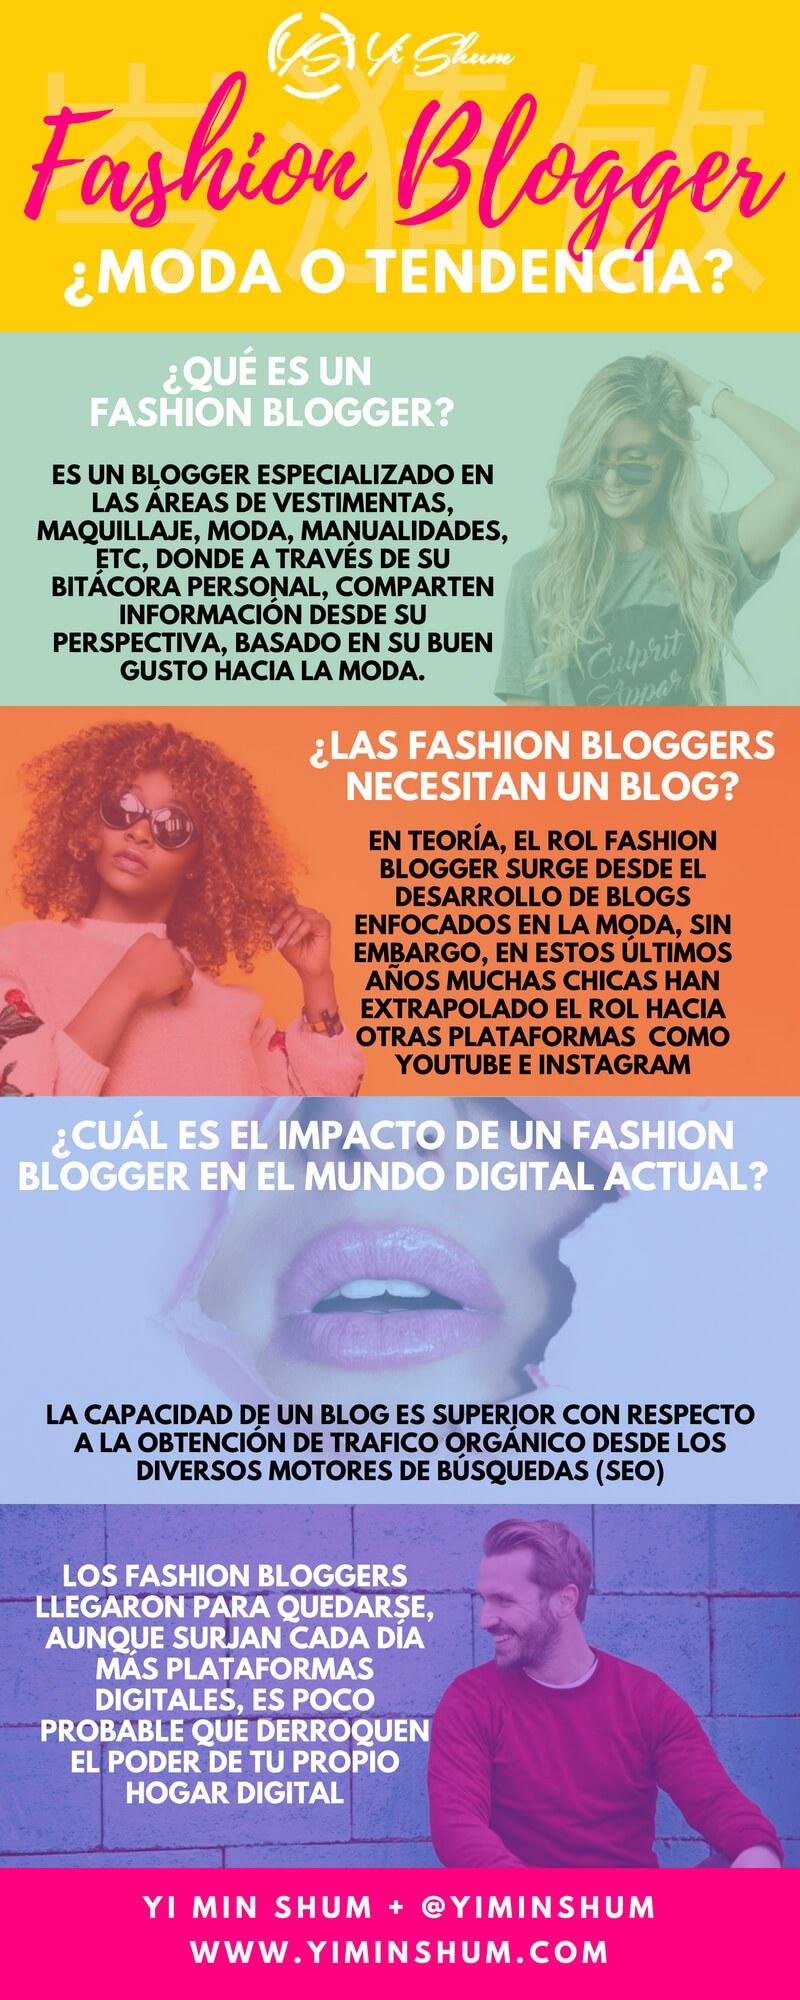 Fashion bloggers ¿moda o tendencia? #infografia #infographic #marketing